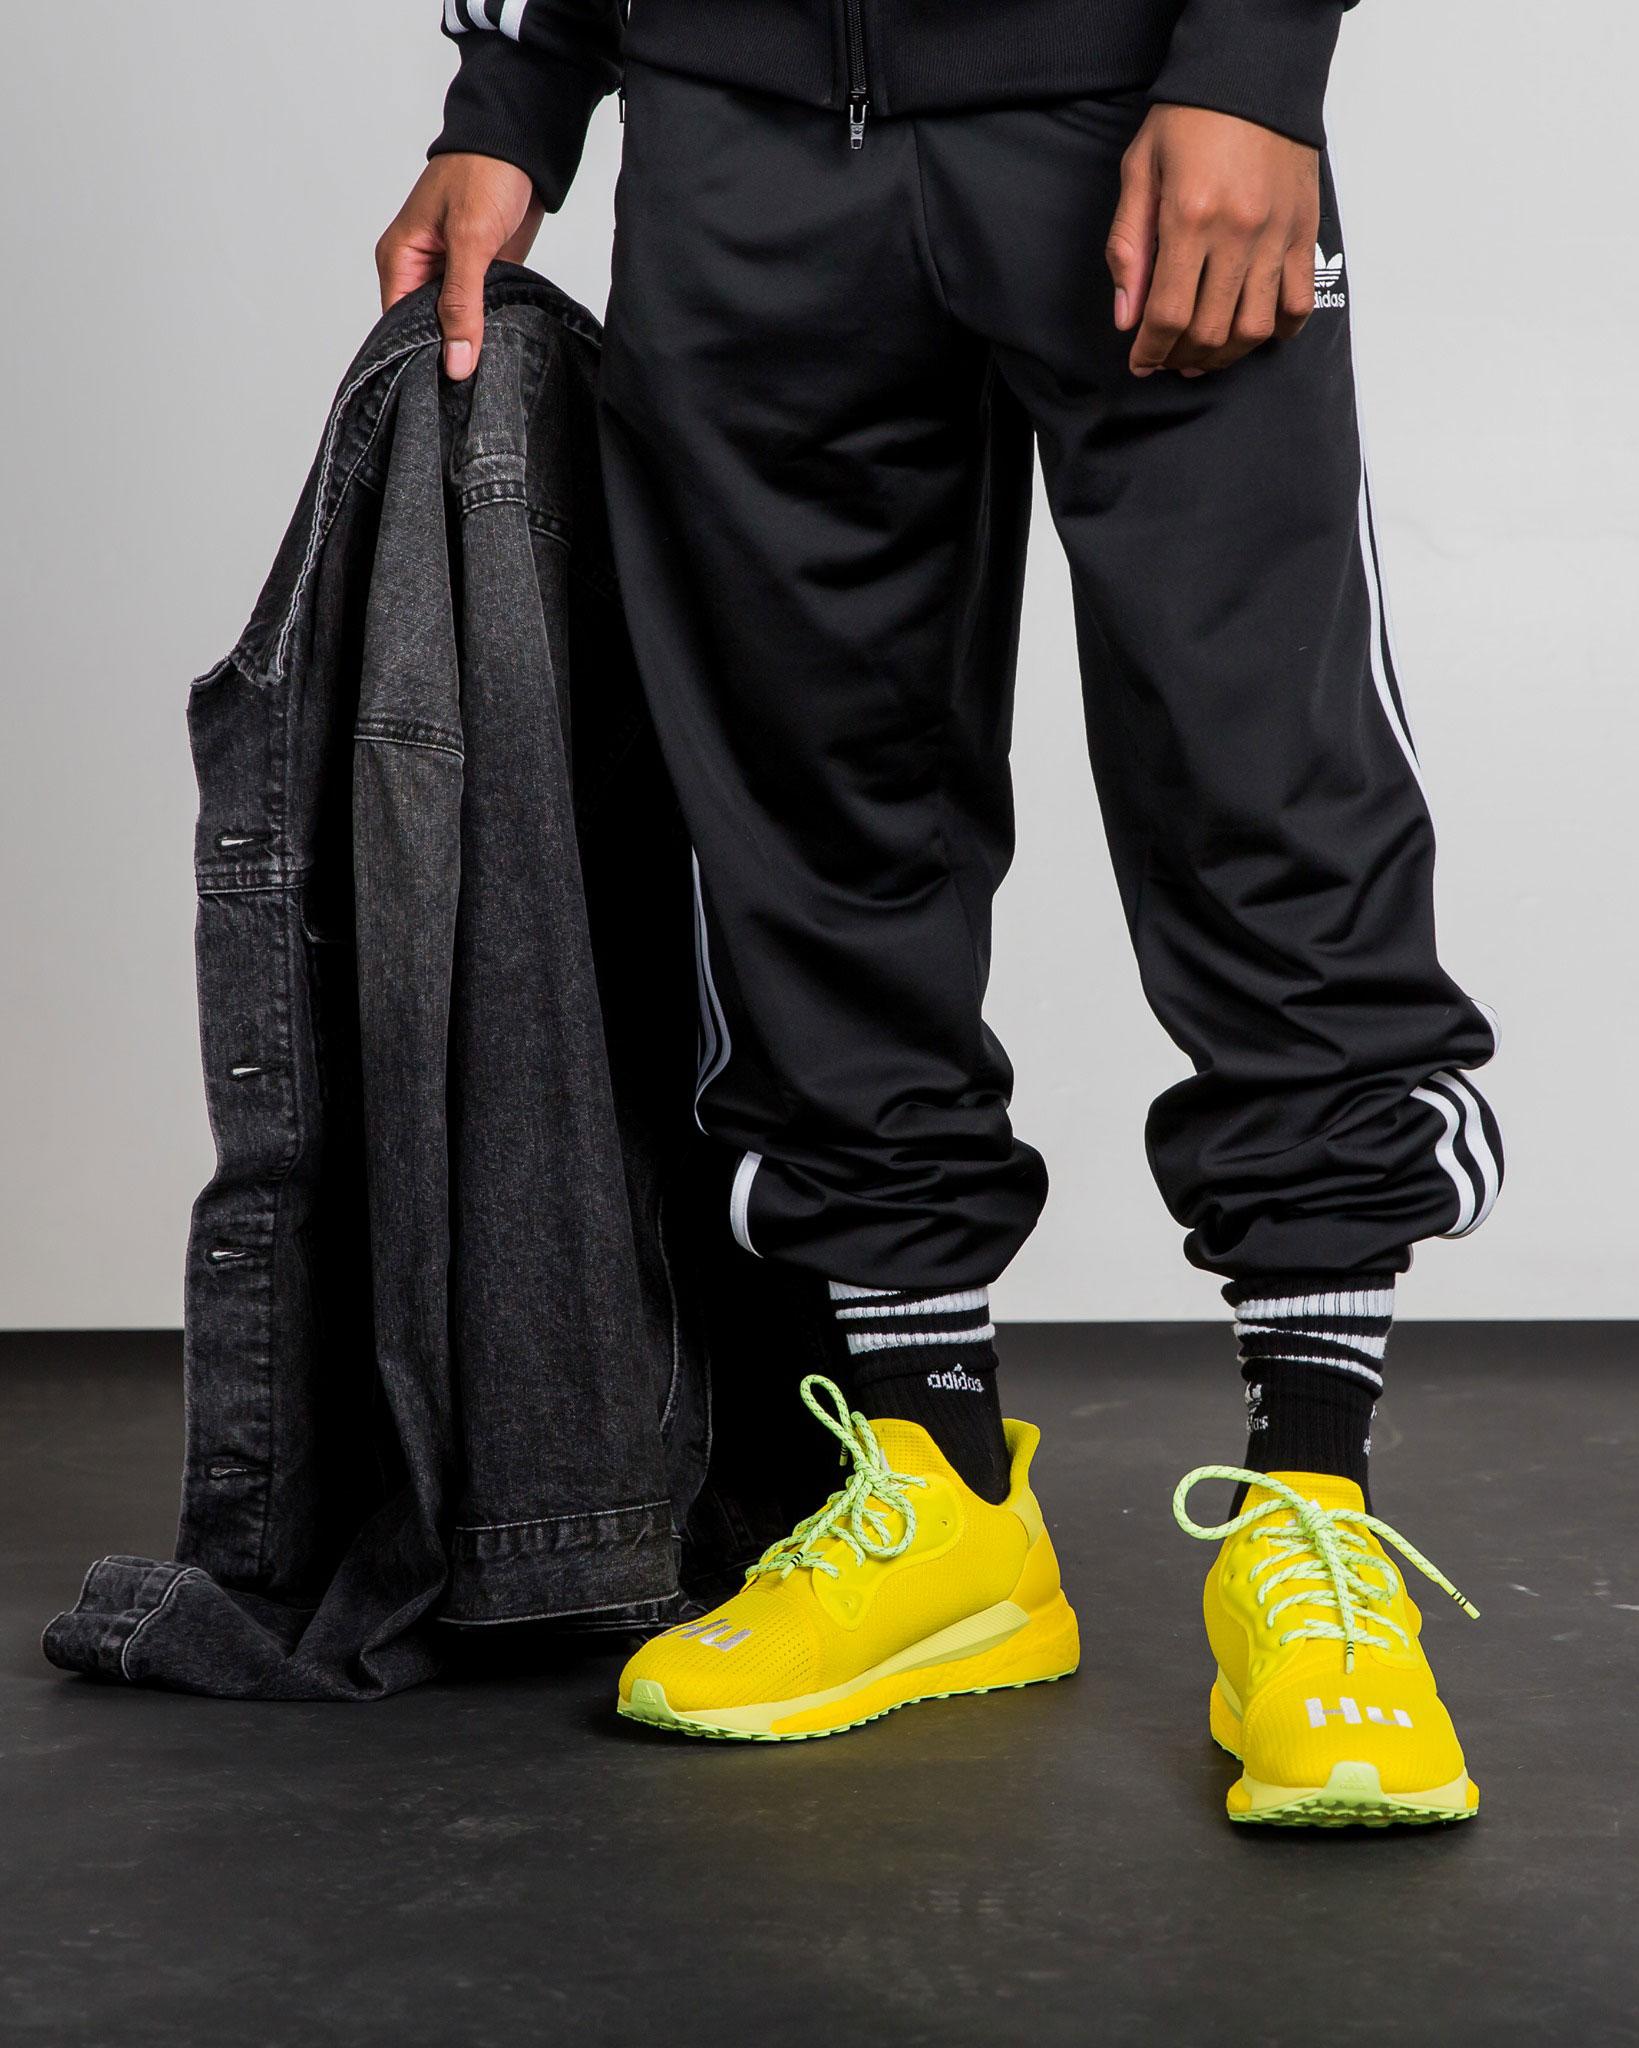 adidas-originals-pharrell-human-race-shoes-clothing-1